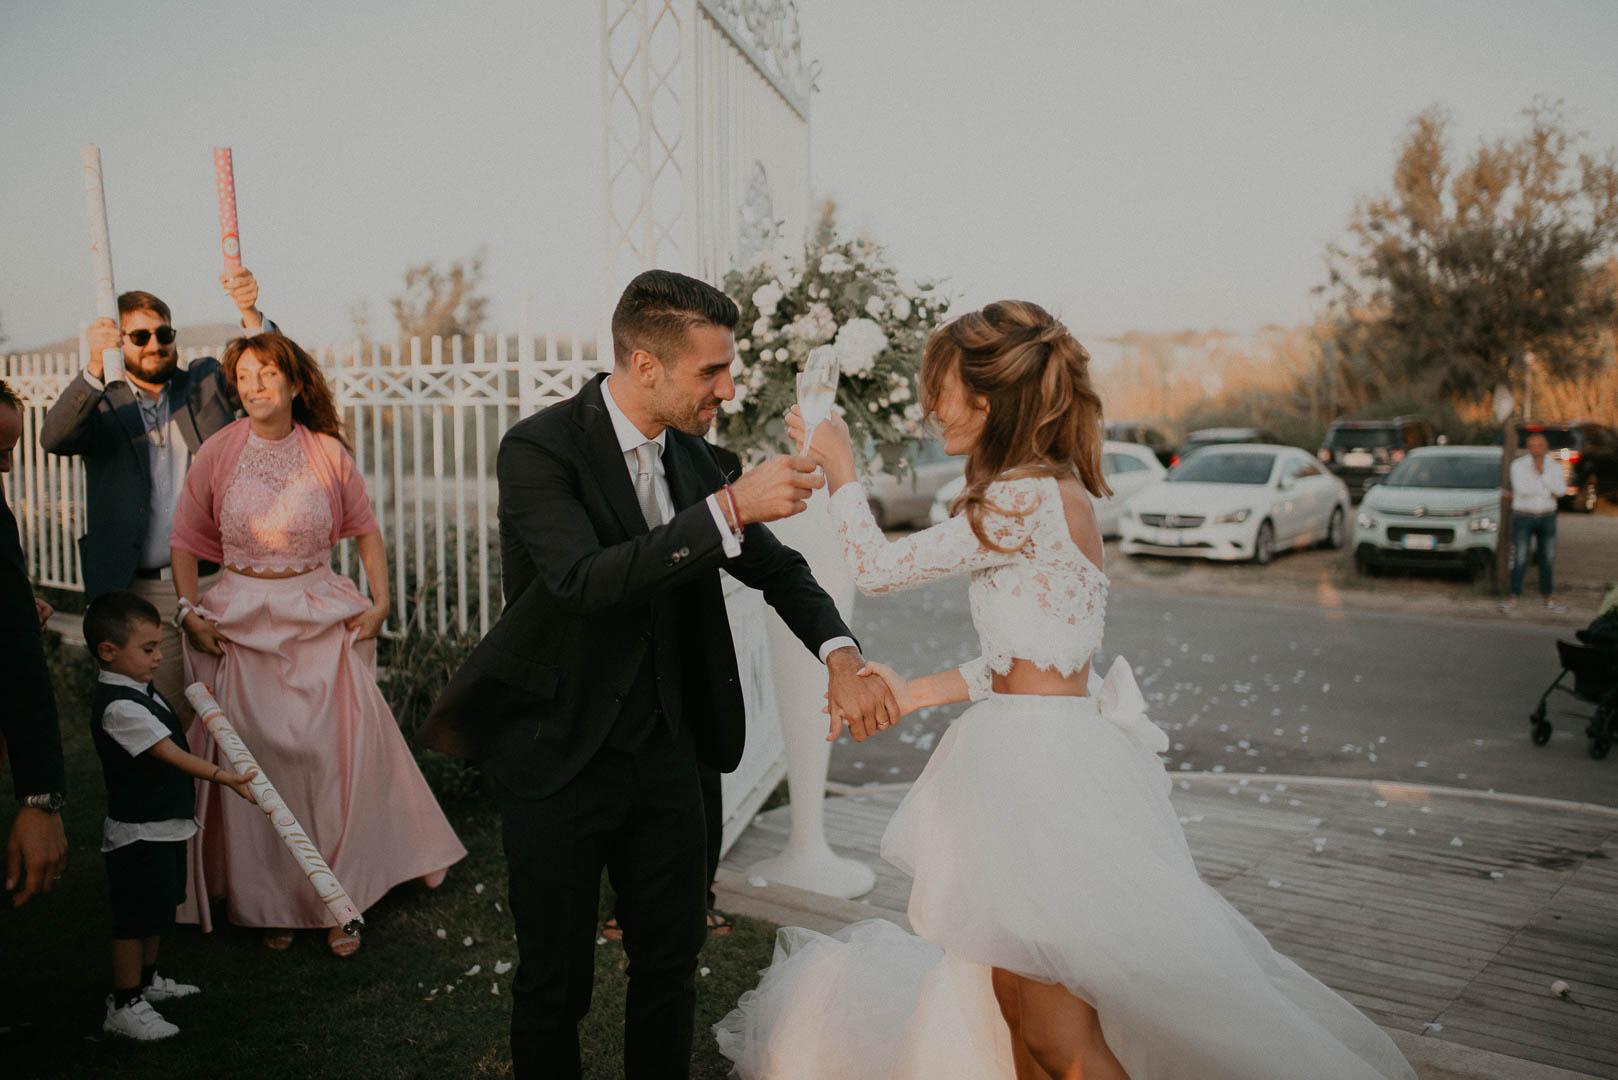 wedding-photographer-destination-fineart-bespoke-reportage-napoli-nabilah-vivianeizzo-spazio46-109